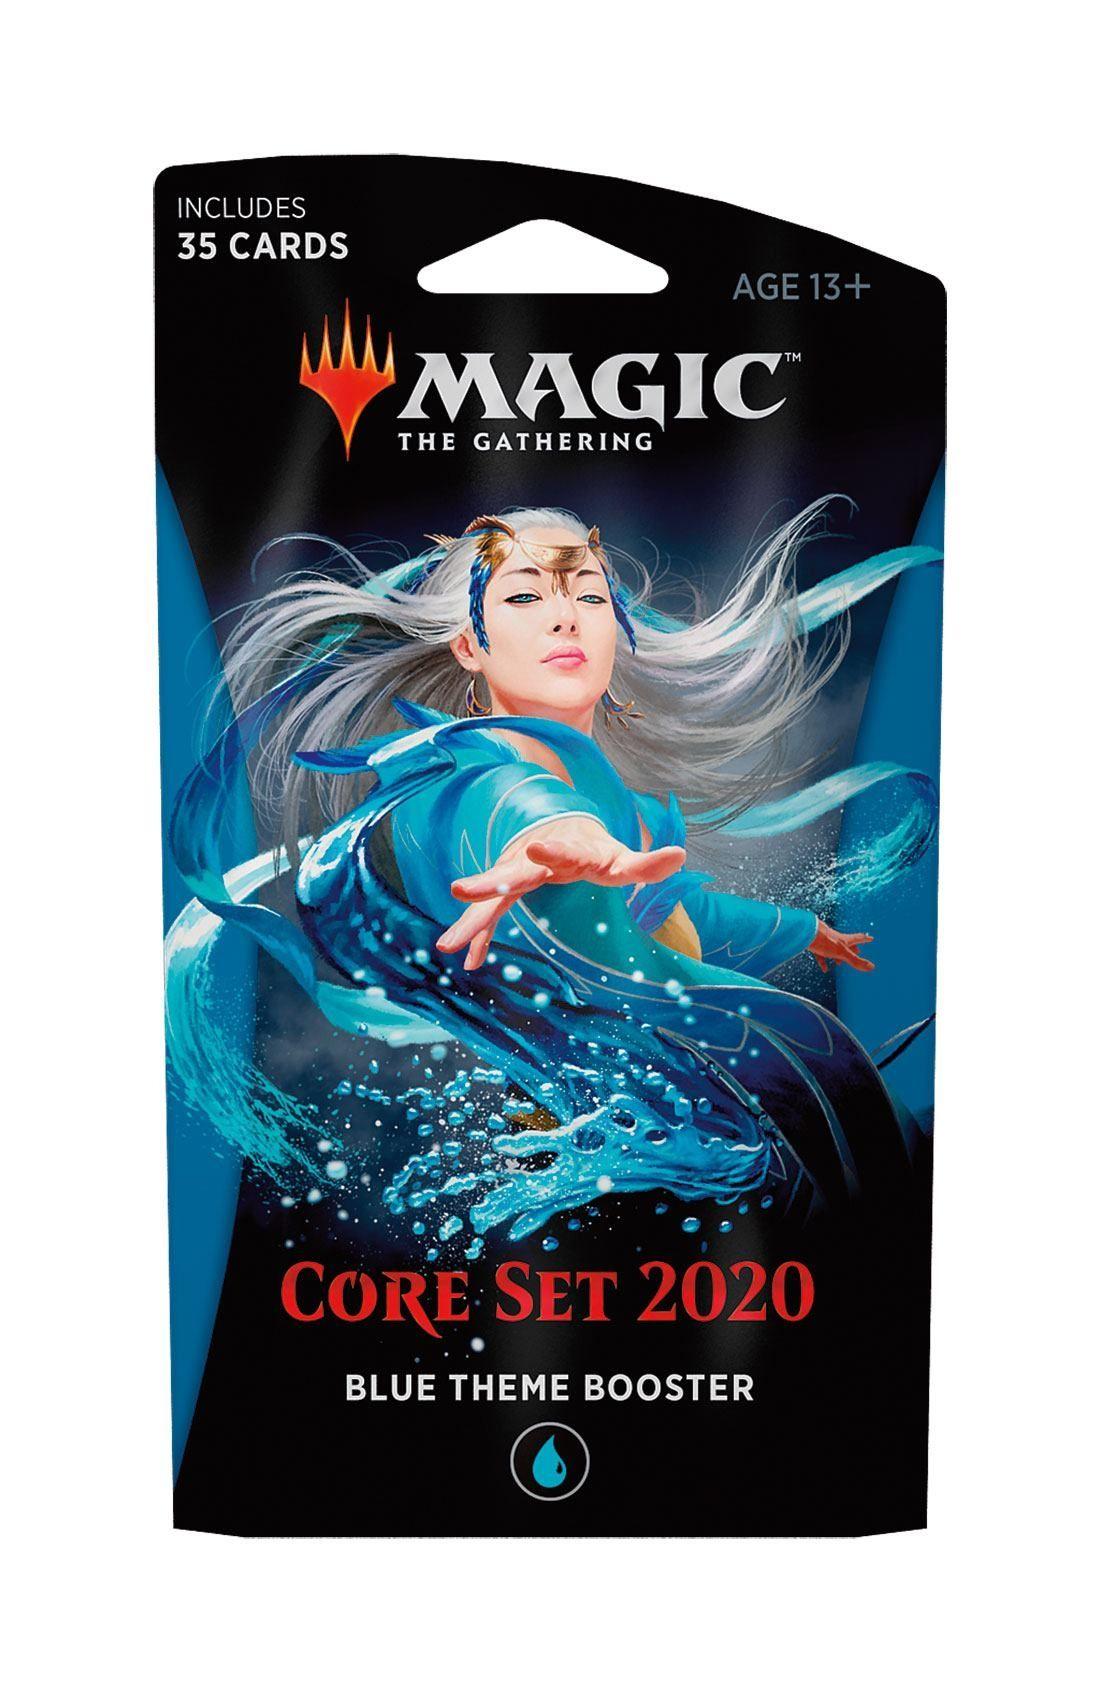 Magic the Gathering - Core Set 2020 Theme Booster Blue - 1